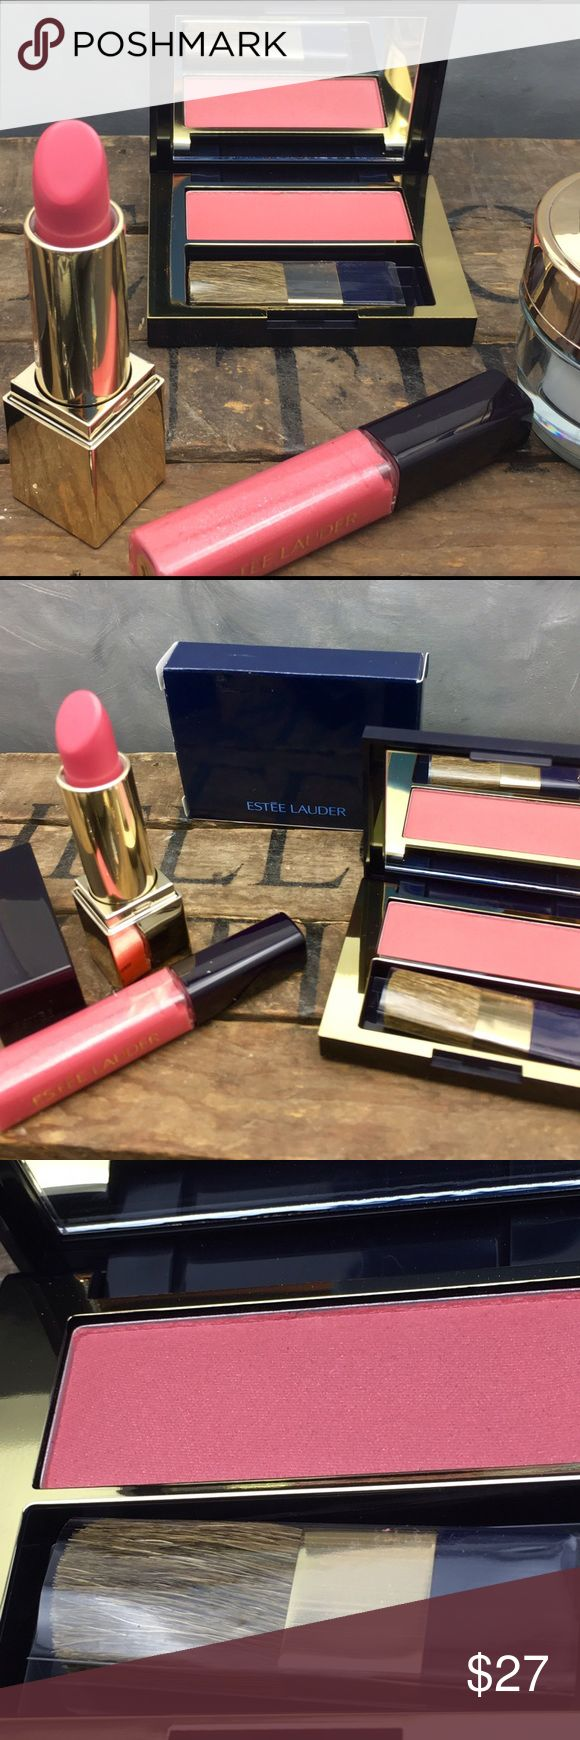 NIB Estée Lauder makeup blush lipstick and gloss Beautiful